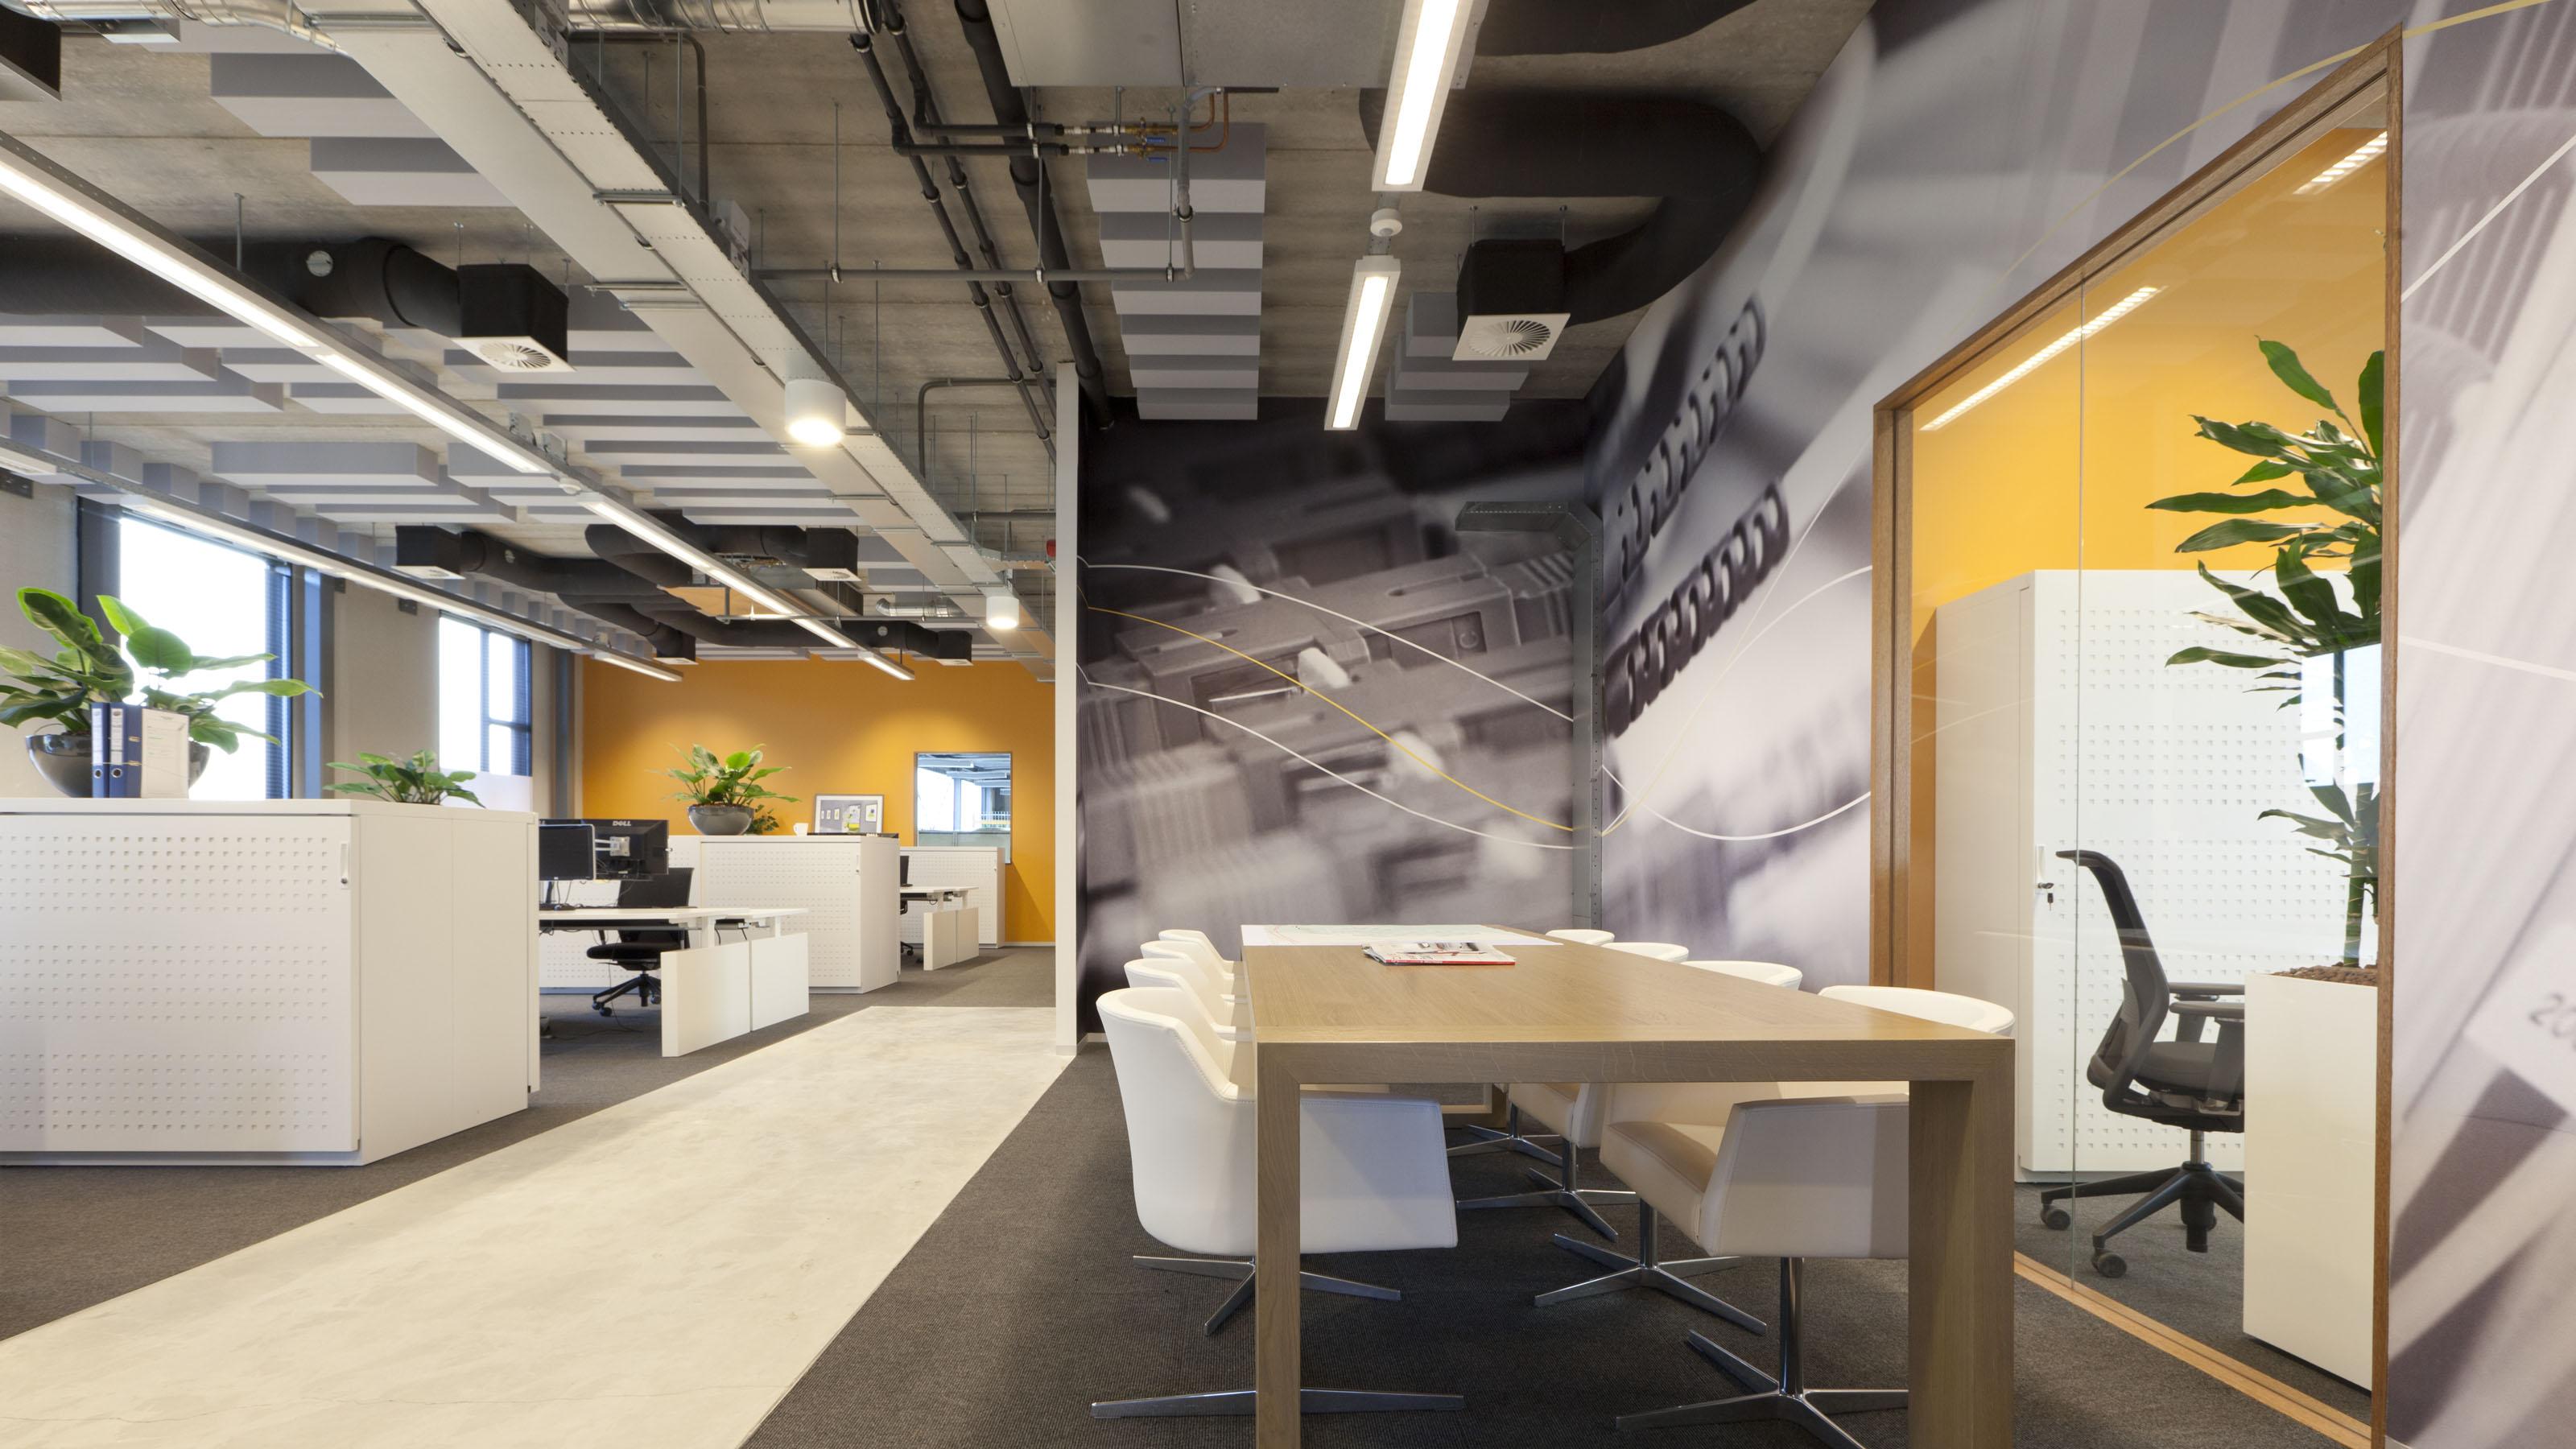 Kantoor en bedrijfshal gebr van der donk egm architects for Kantoor architect